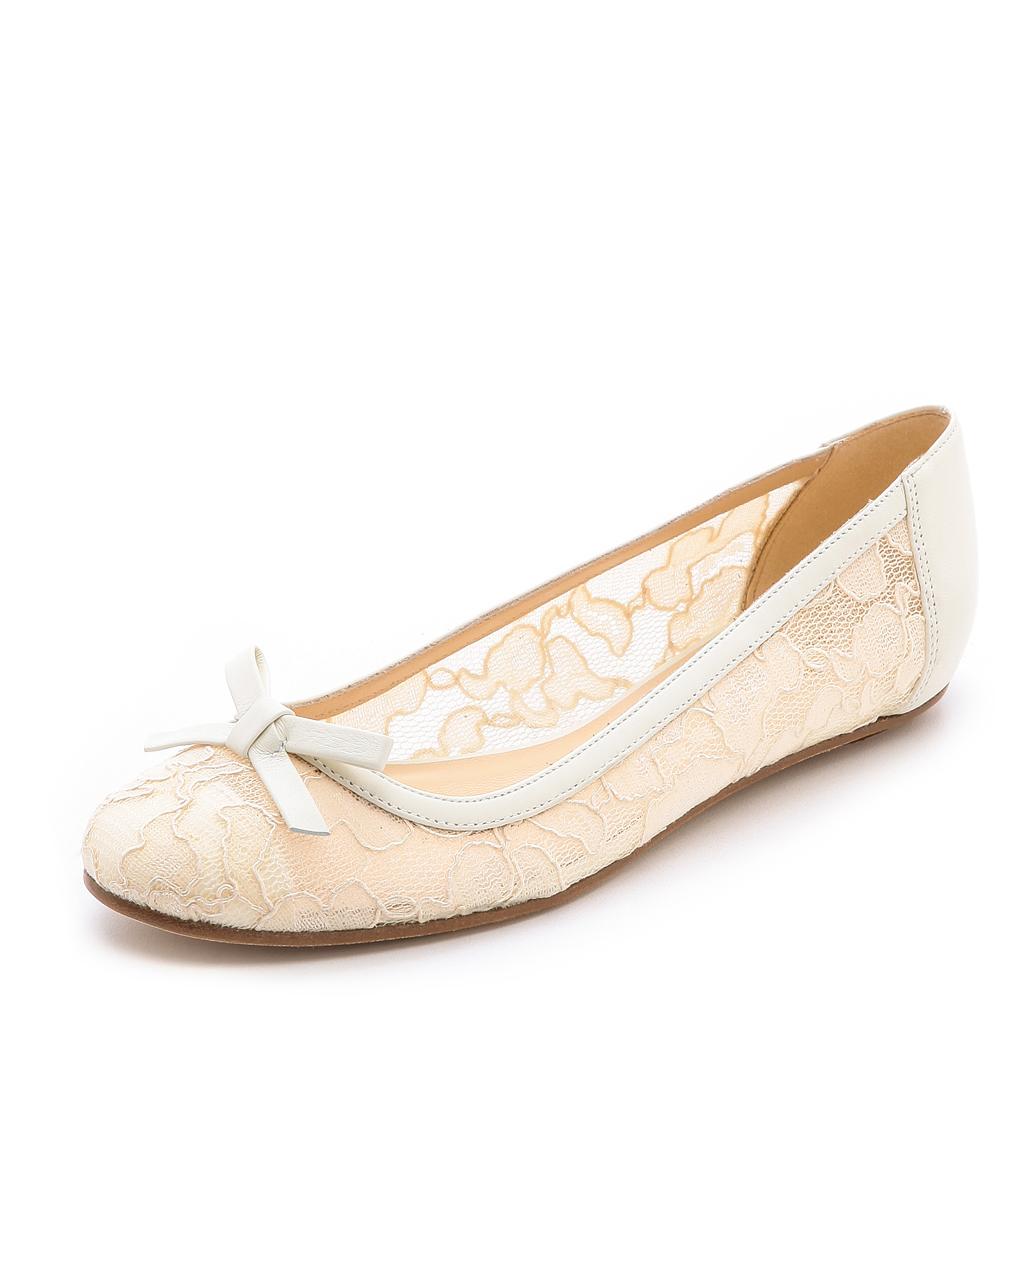 fall-wedding-shoes-kate-spade-banner-0914.jpg